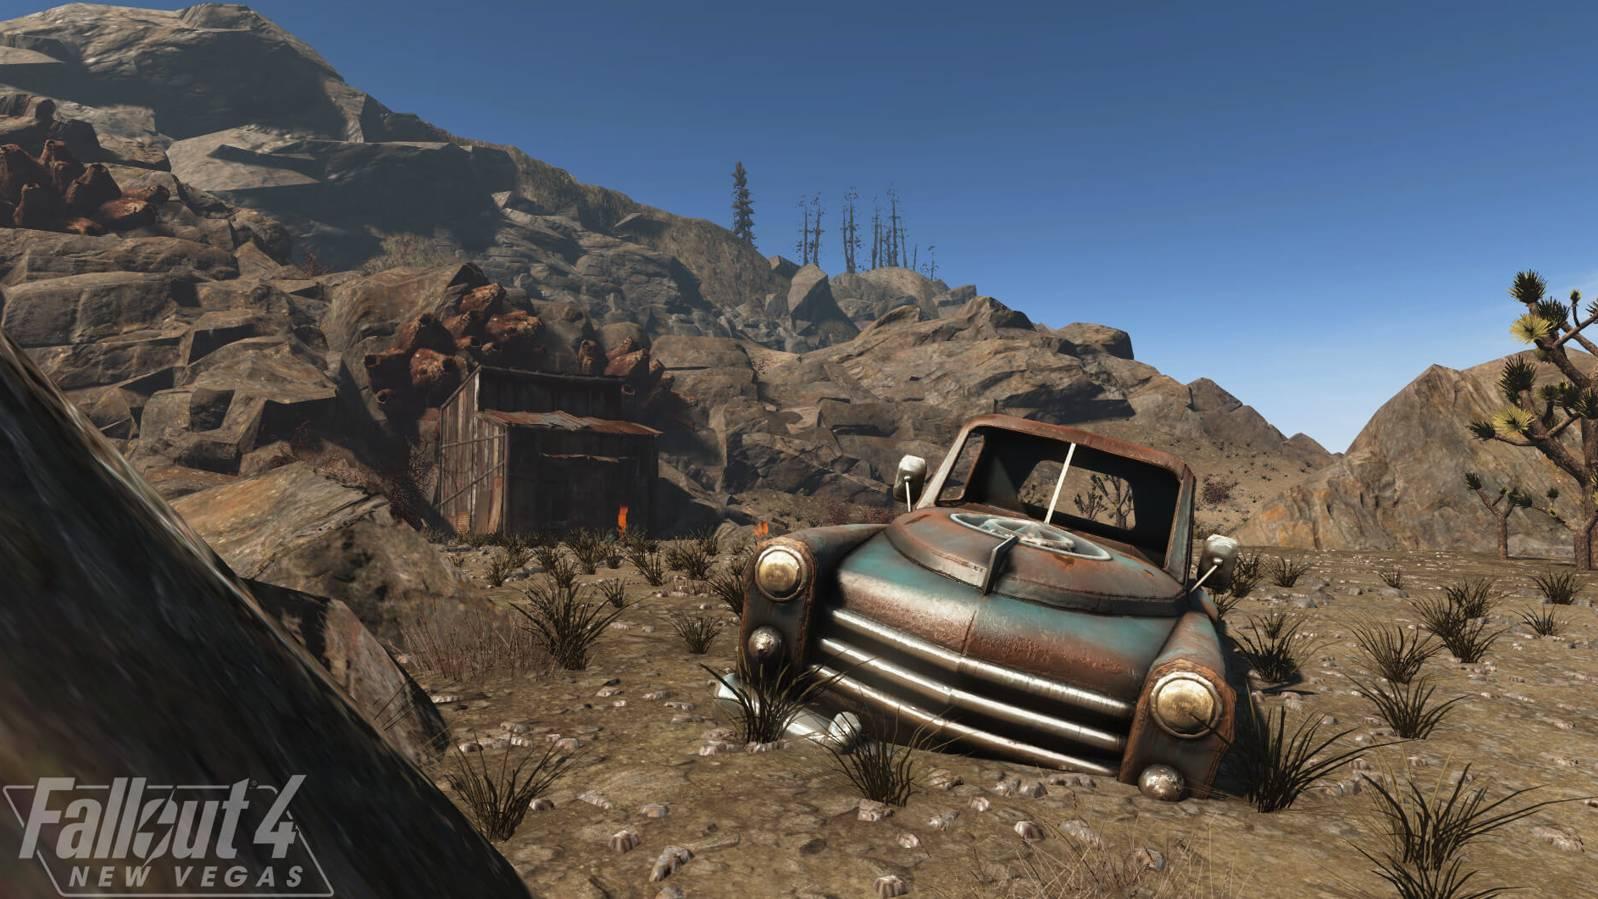 Fallout 4 New Vegas MOD